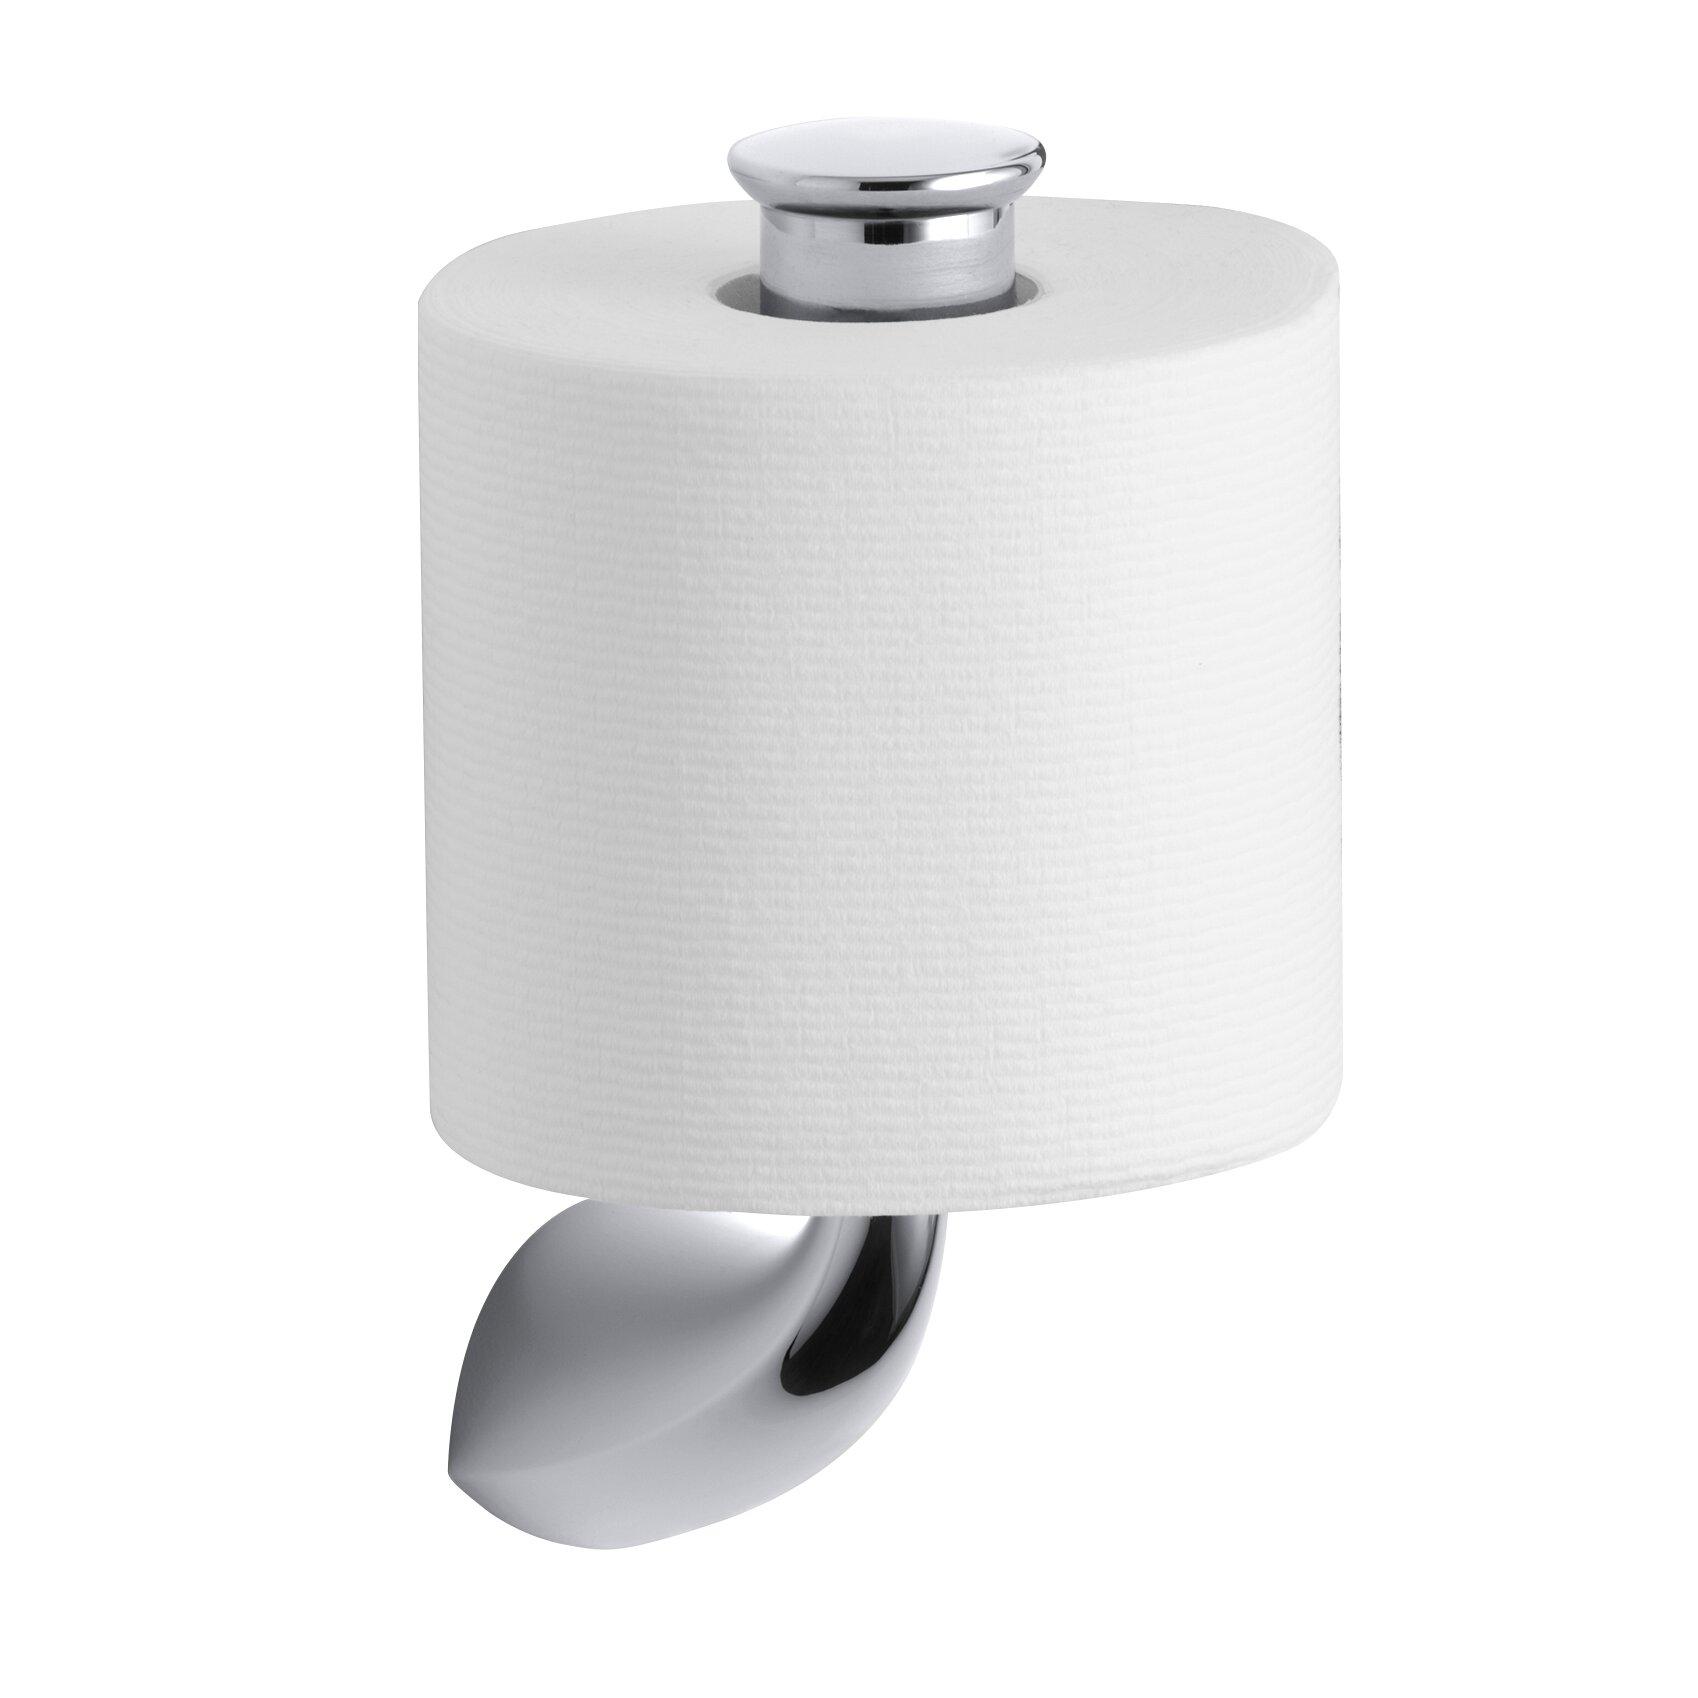 alteo vertical toilet paper holder